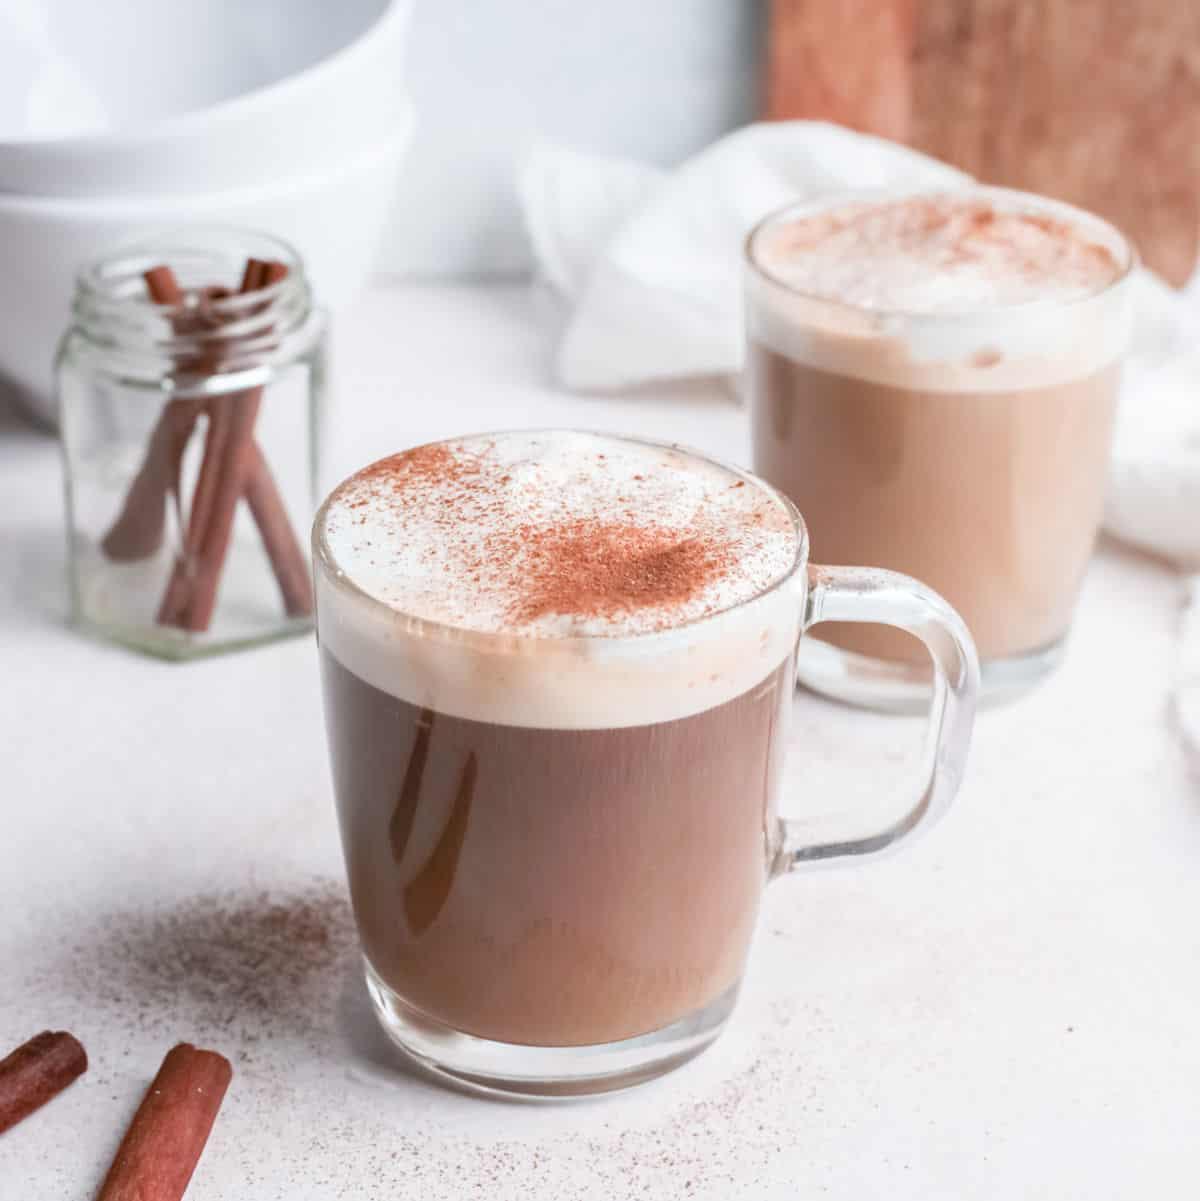 Copycat Starbucks cinnamon dolce latte in glass mug on table.